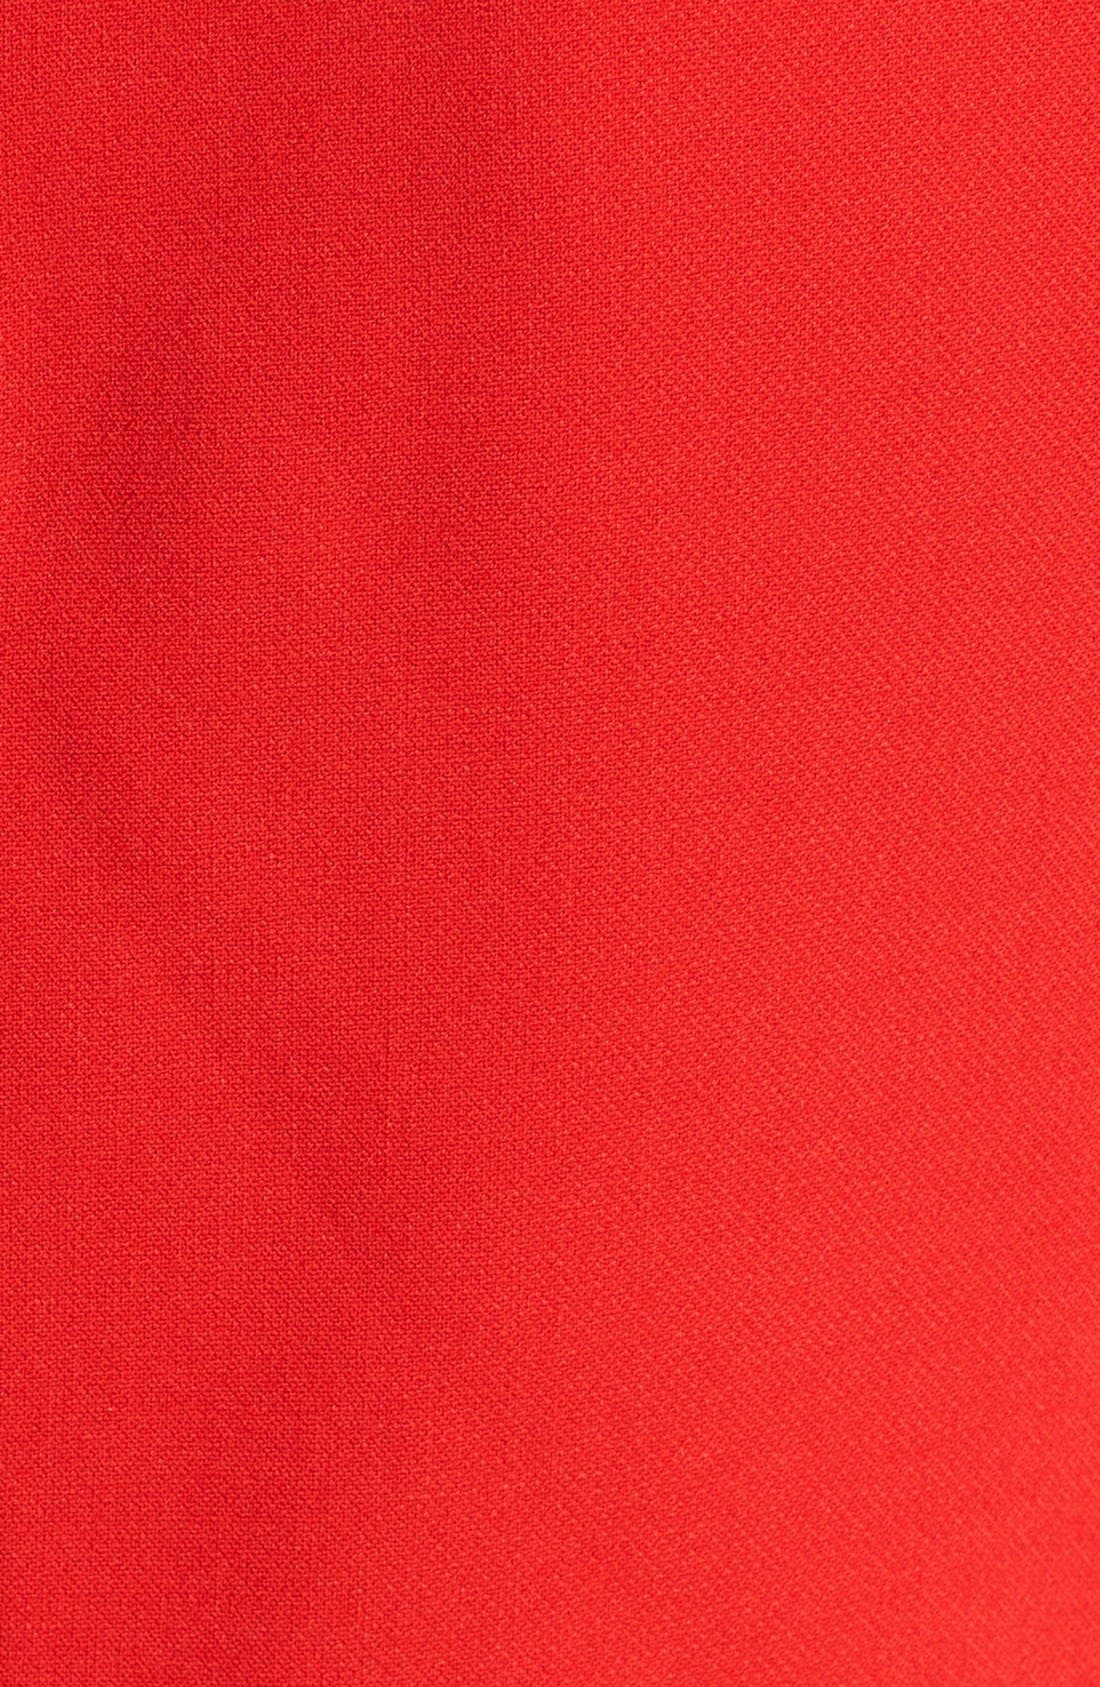 Alternate Image 3  - Diane von Furstenberg 'Paloma' Woven Fit & Flare Dress